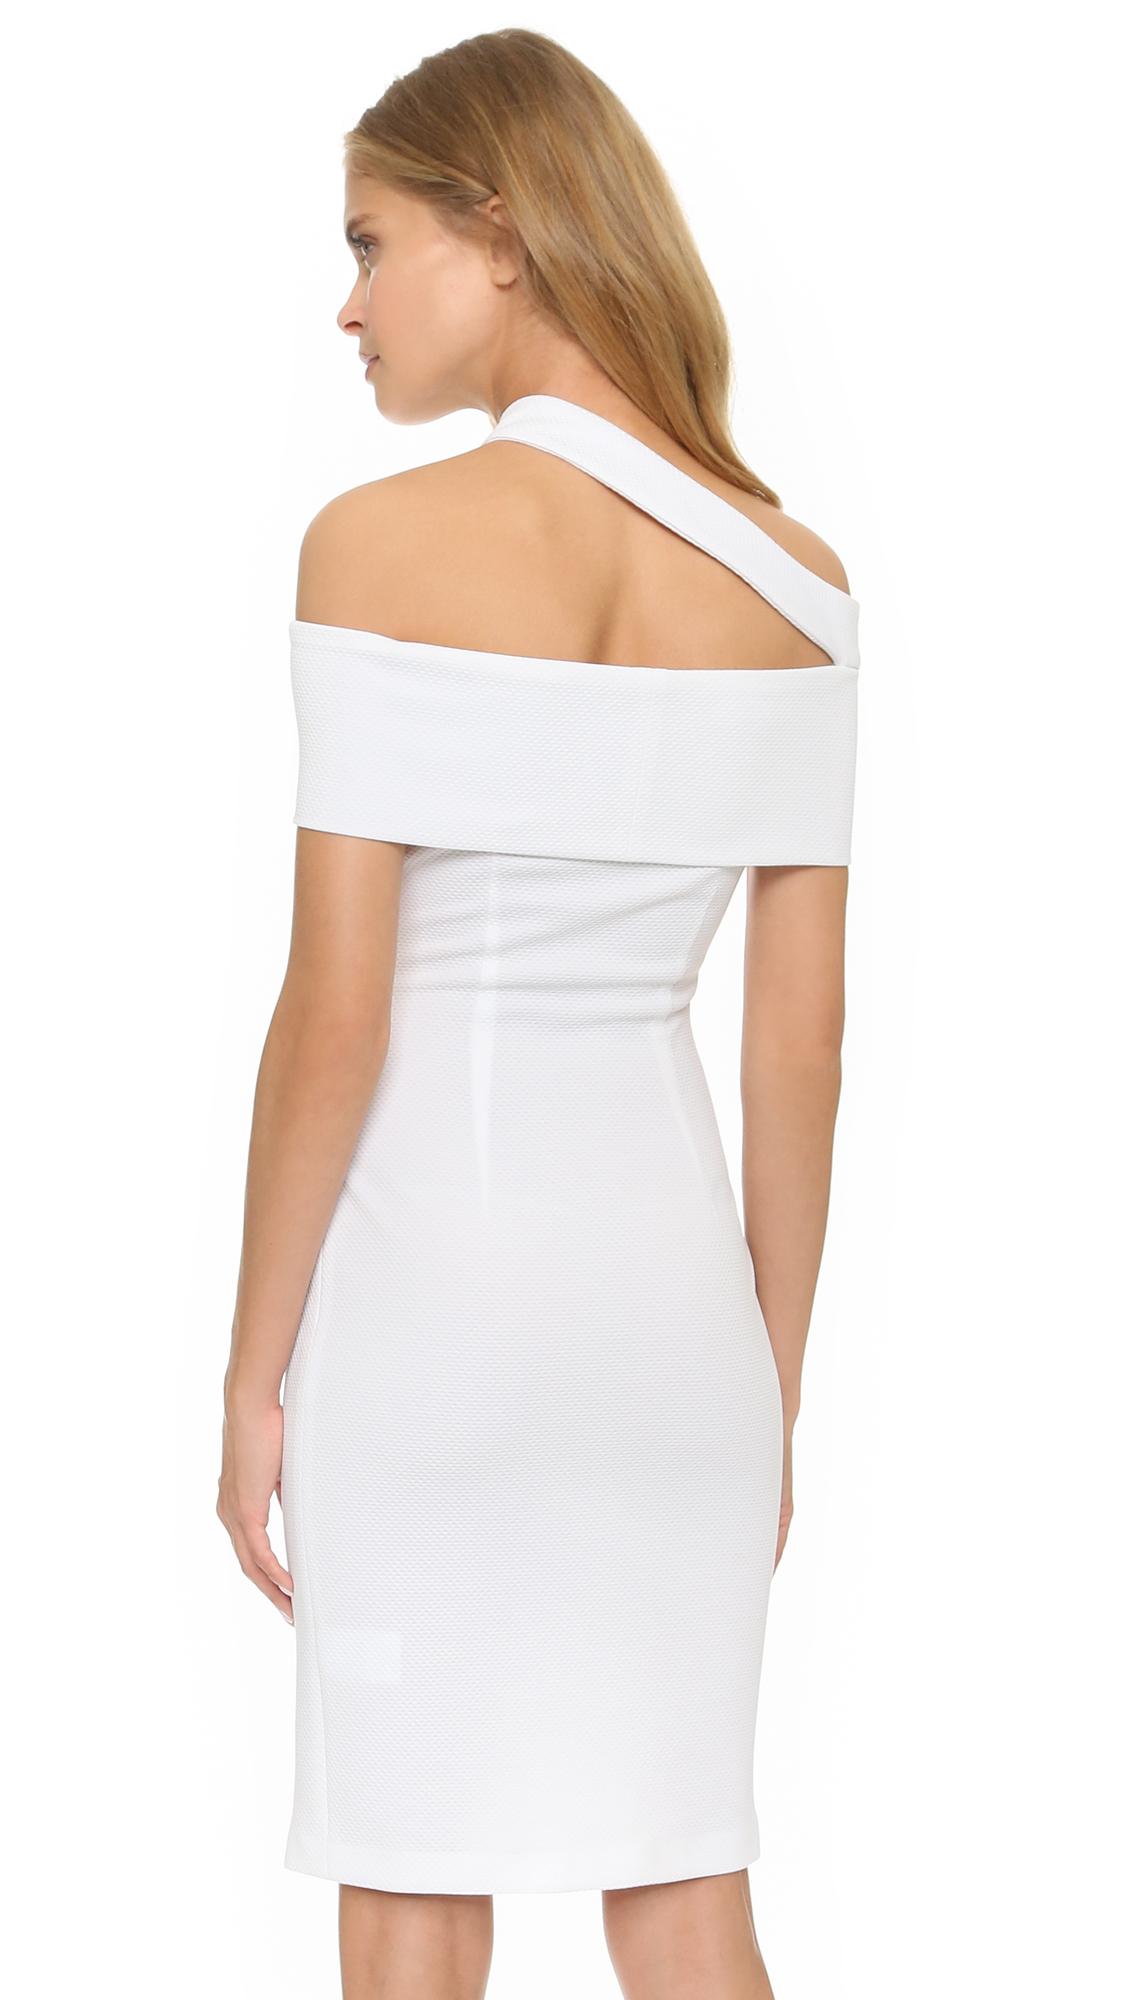 Nicholas dress white.